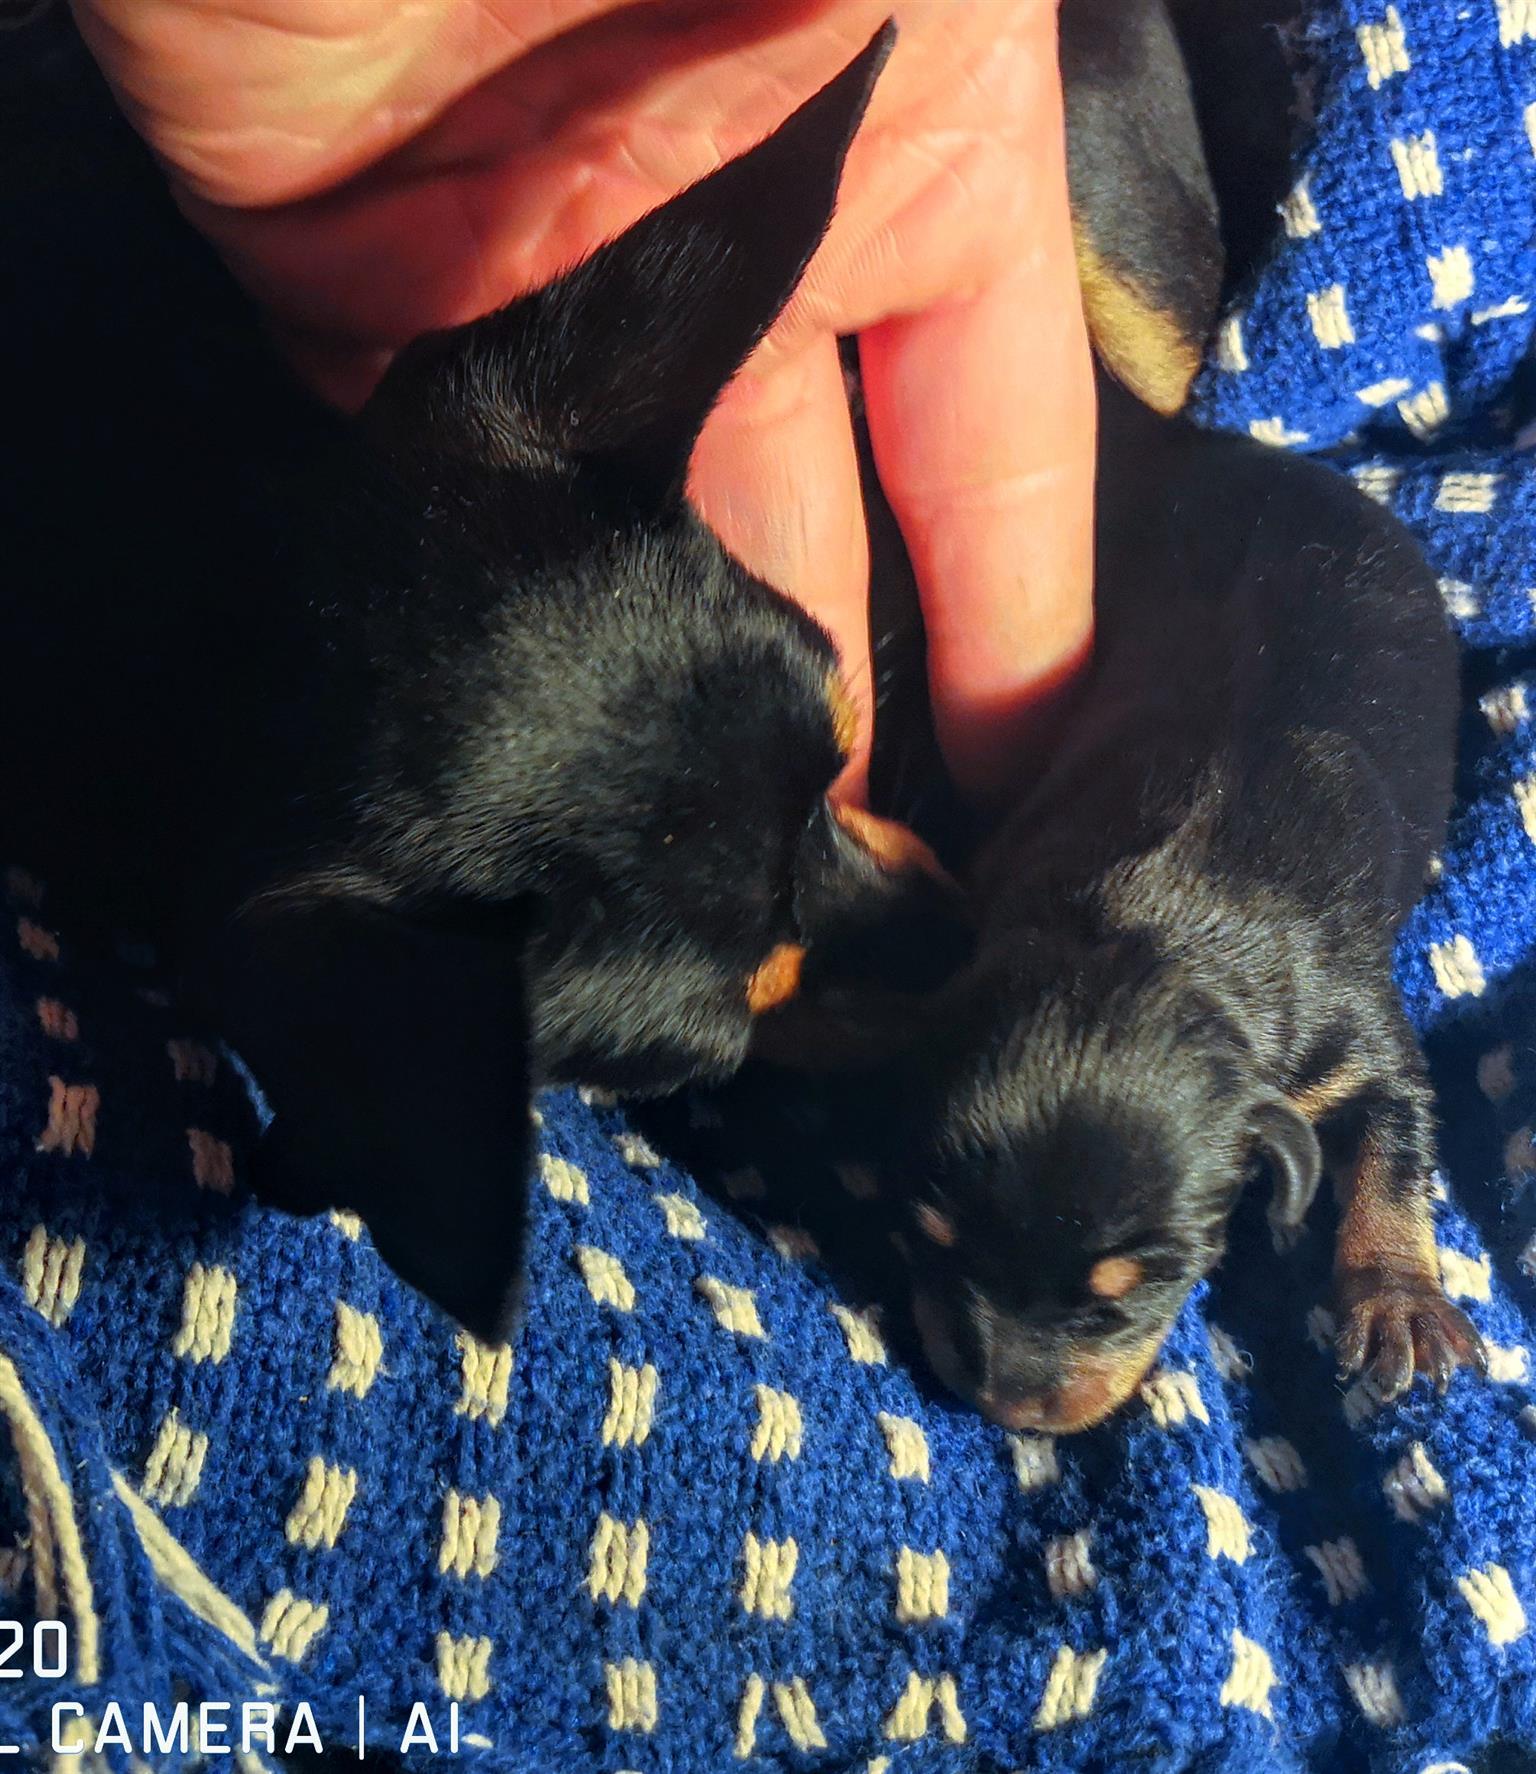 Teacup/Pocket size Miniature Doberman Pinscher Bokkie Puppies